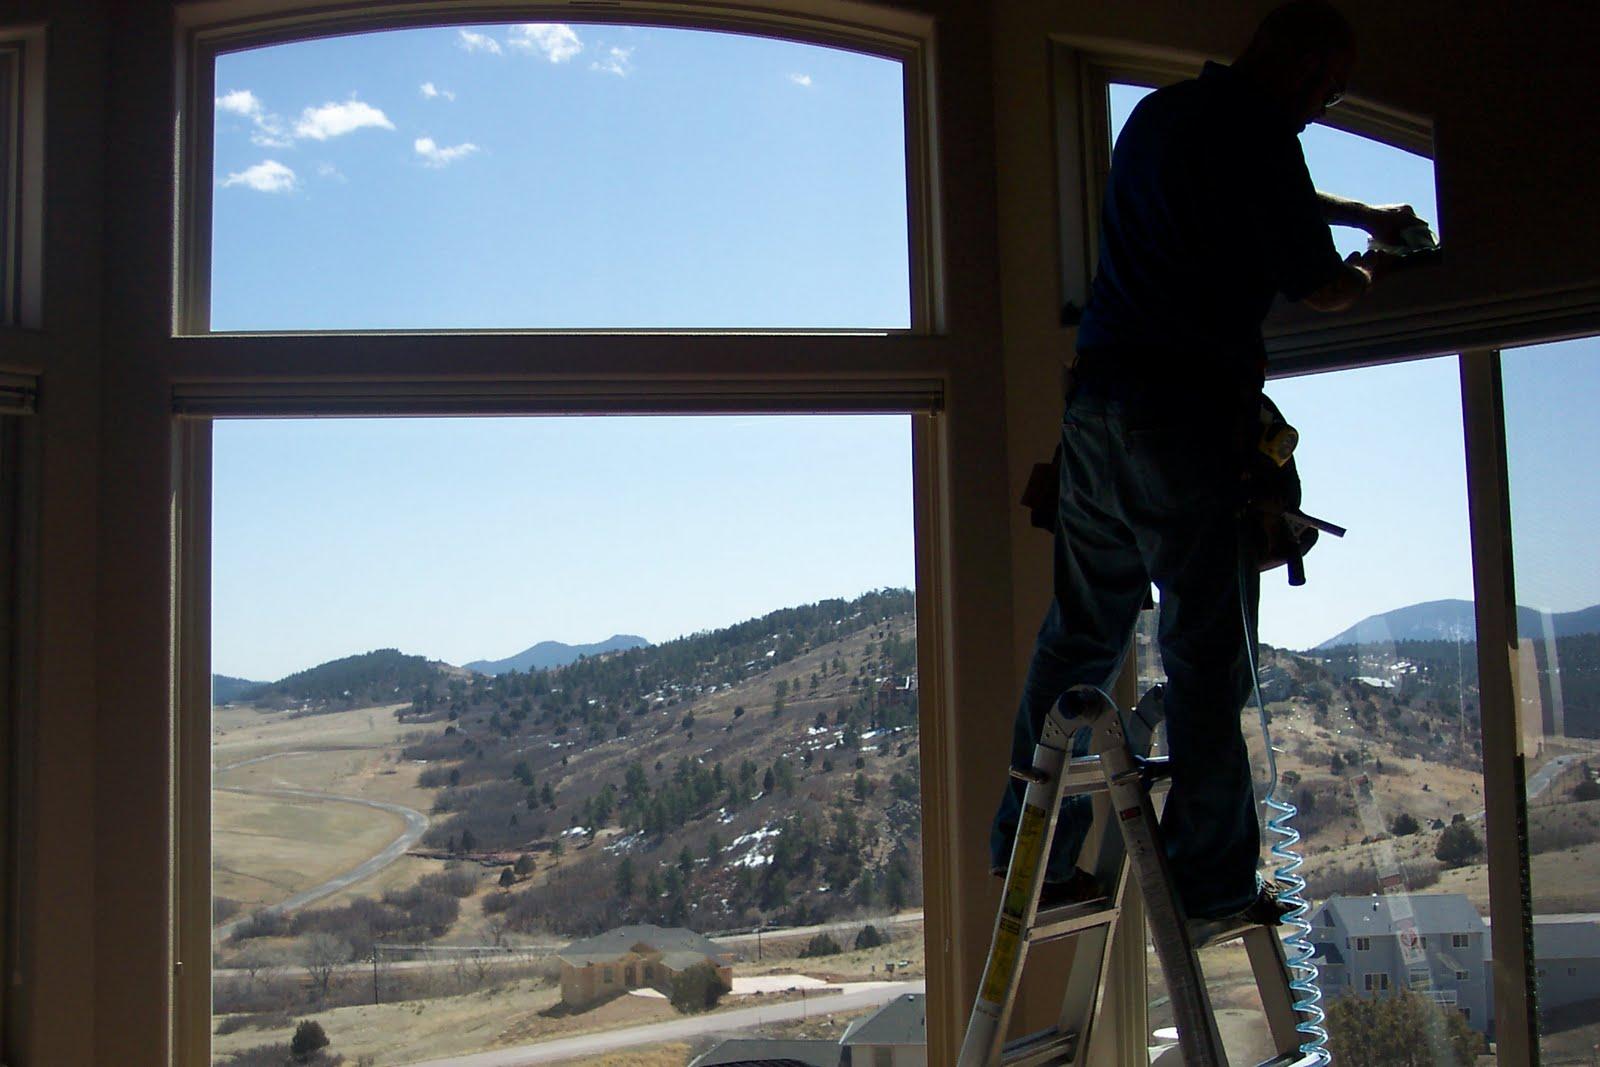 Large windows tinting film